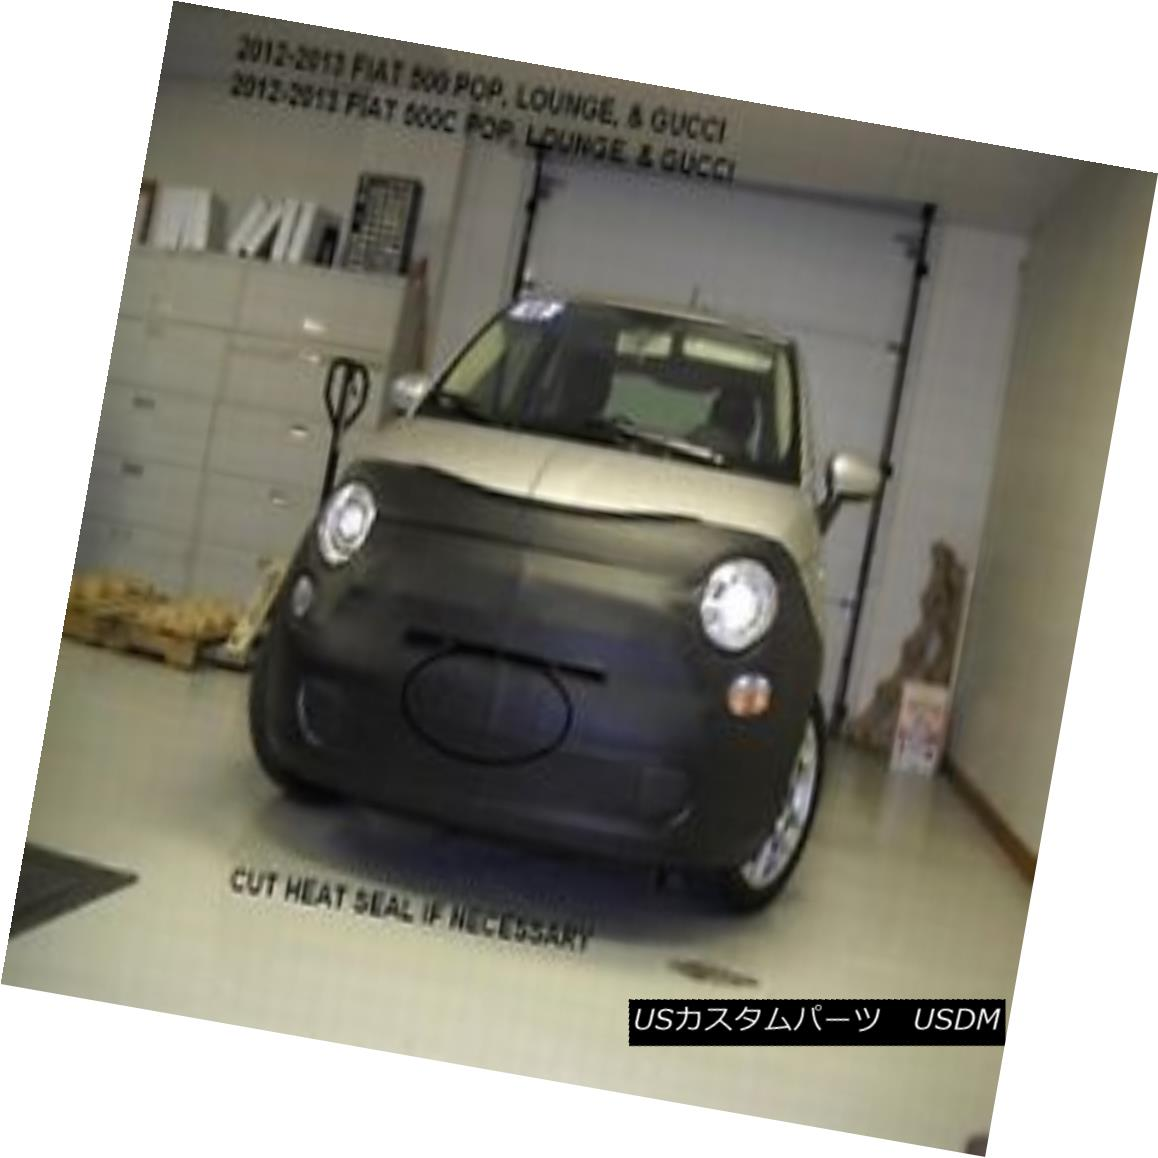 USフルブラ・USノーズブラ Lebra Front Mask Cover Bra Fits 2012-2017 Fiat 500 & 500C POP, Lounge & Gucci Lebraフロントマスクカバーブラフィット2012-2017 Fiat 500& 500C POP、ラウンジ& グッチ